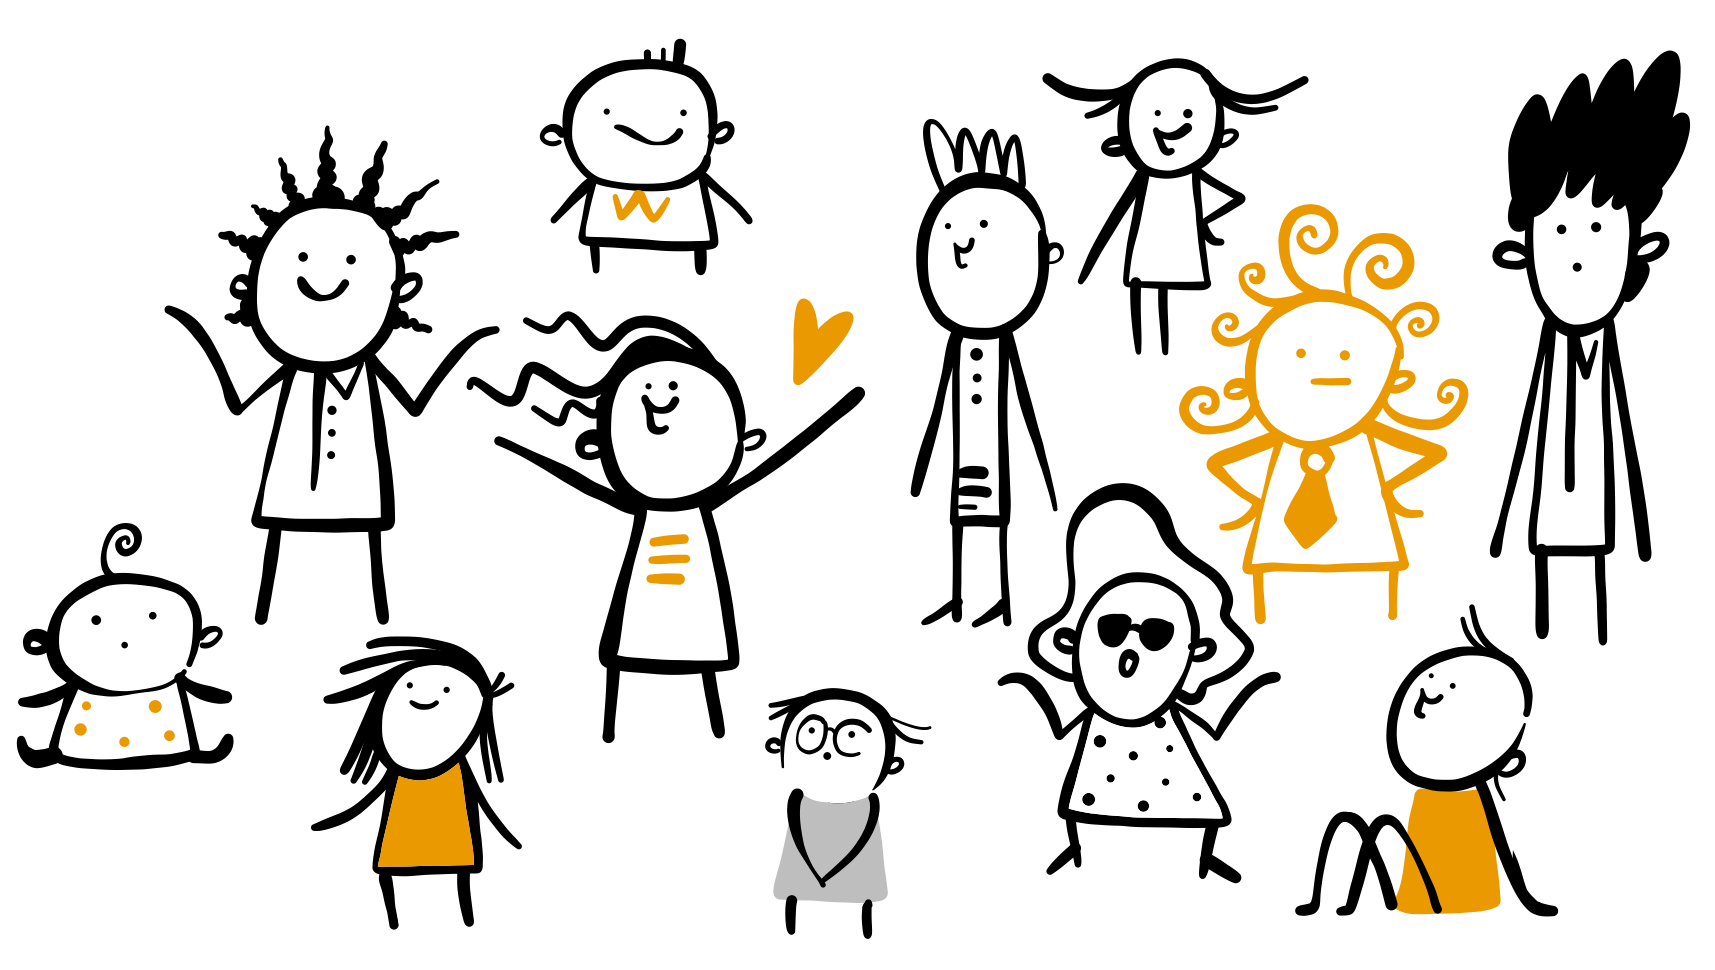 Körper übung strichmännchen Stockvektoren, lizenzfreie Körper übung  strichmännchen Illustrationen | Depositphotos®